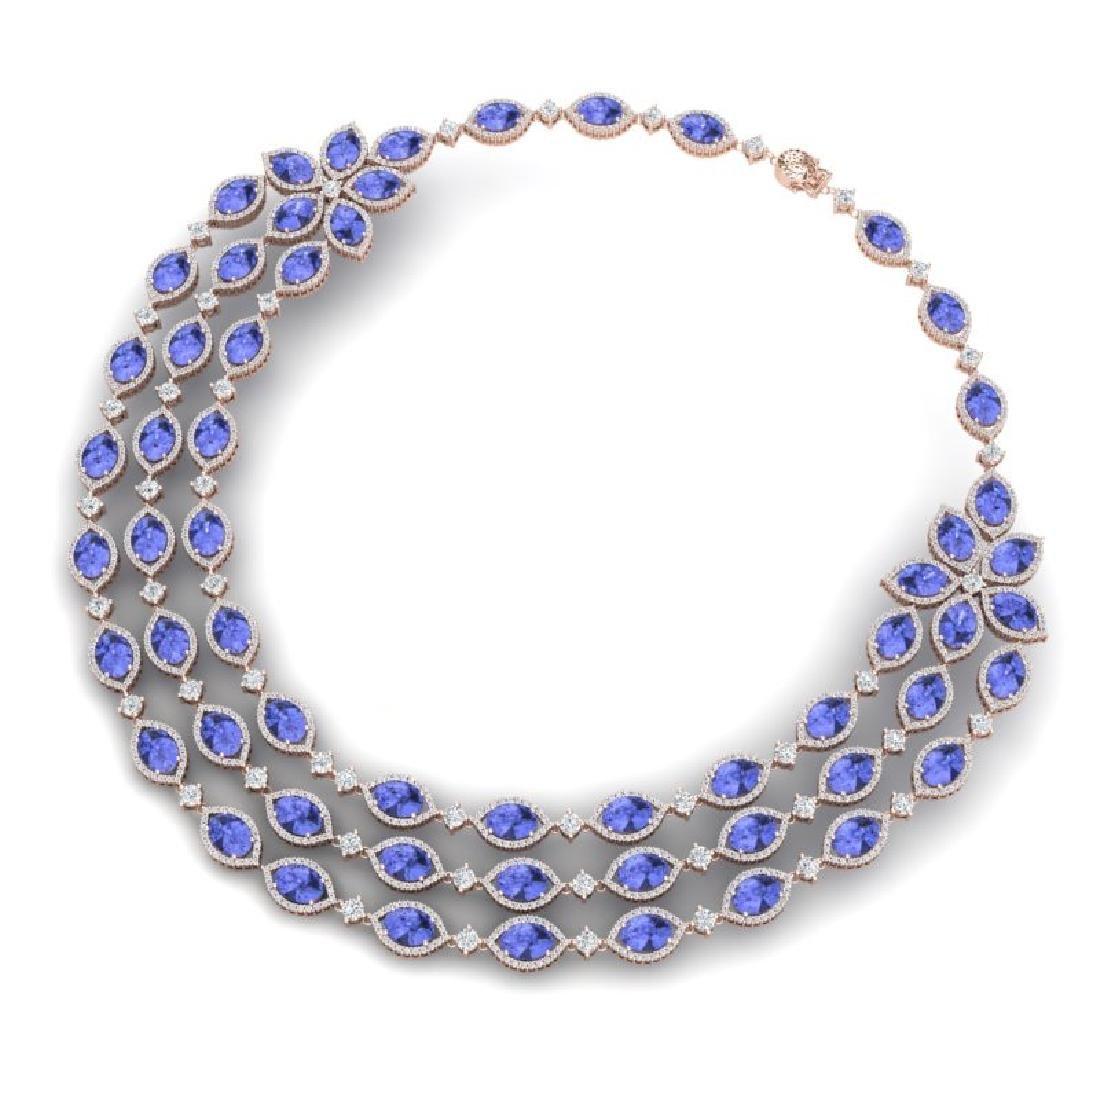 79.33 CTW Royalty Tanzanite & VS Diamond Necklace 18K - 3